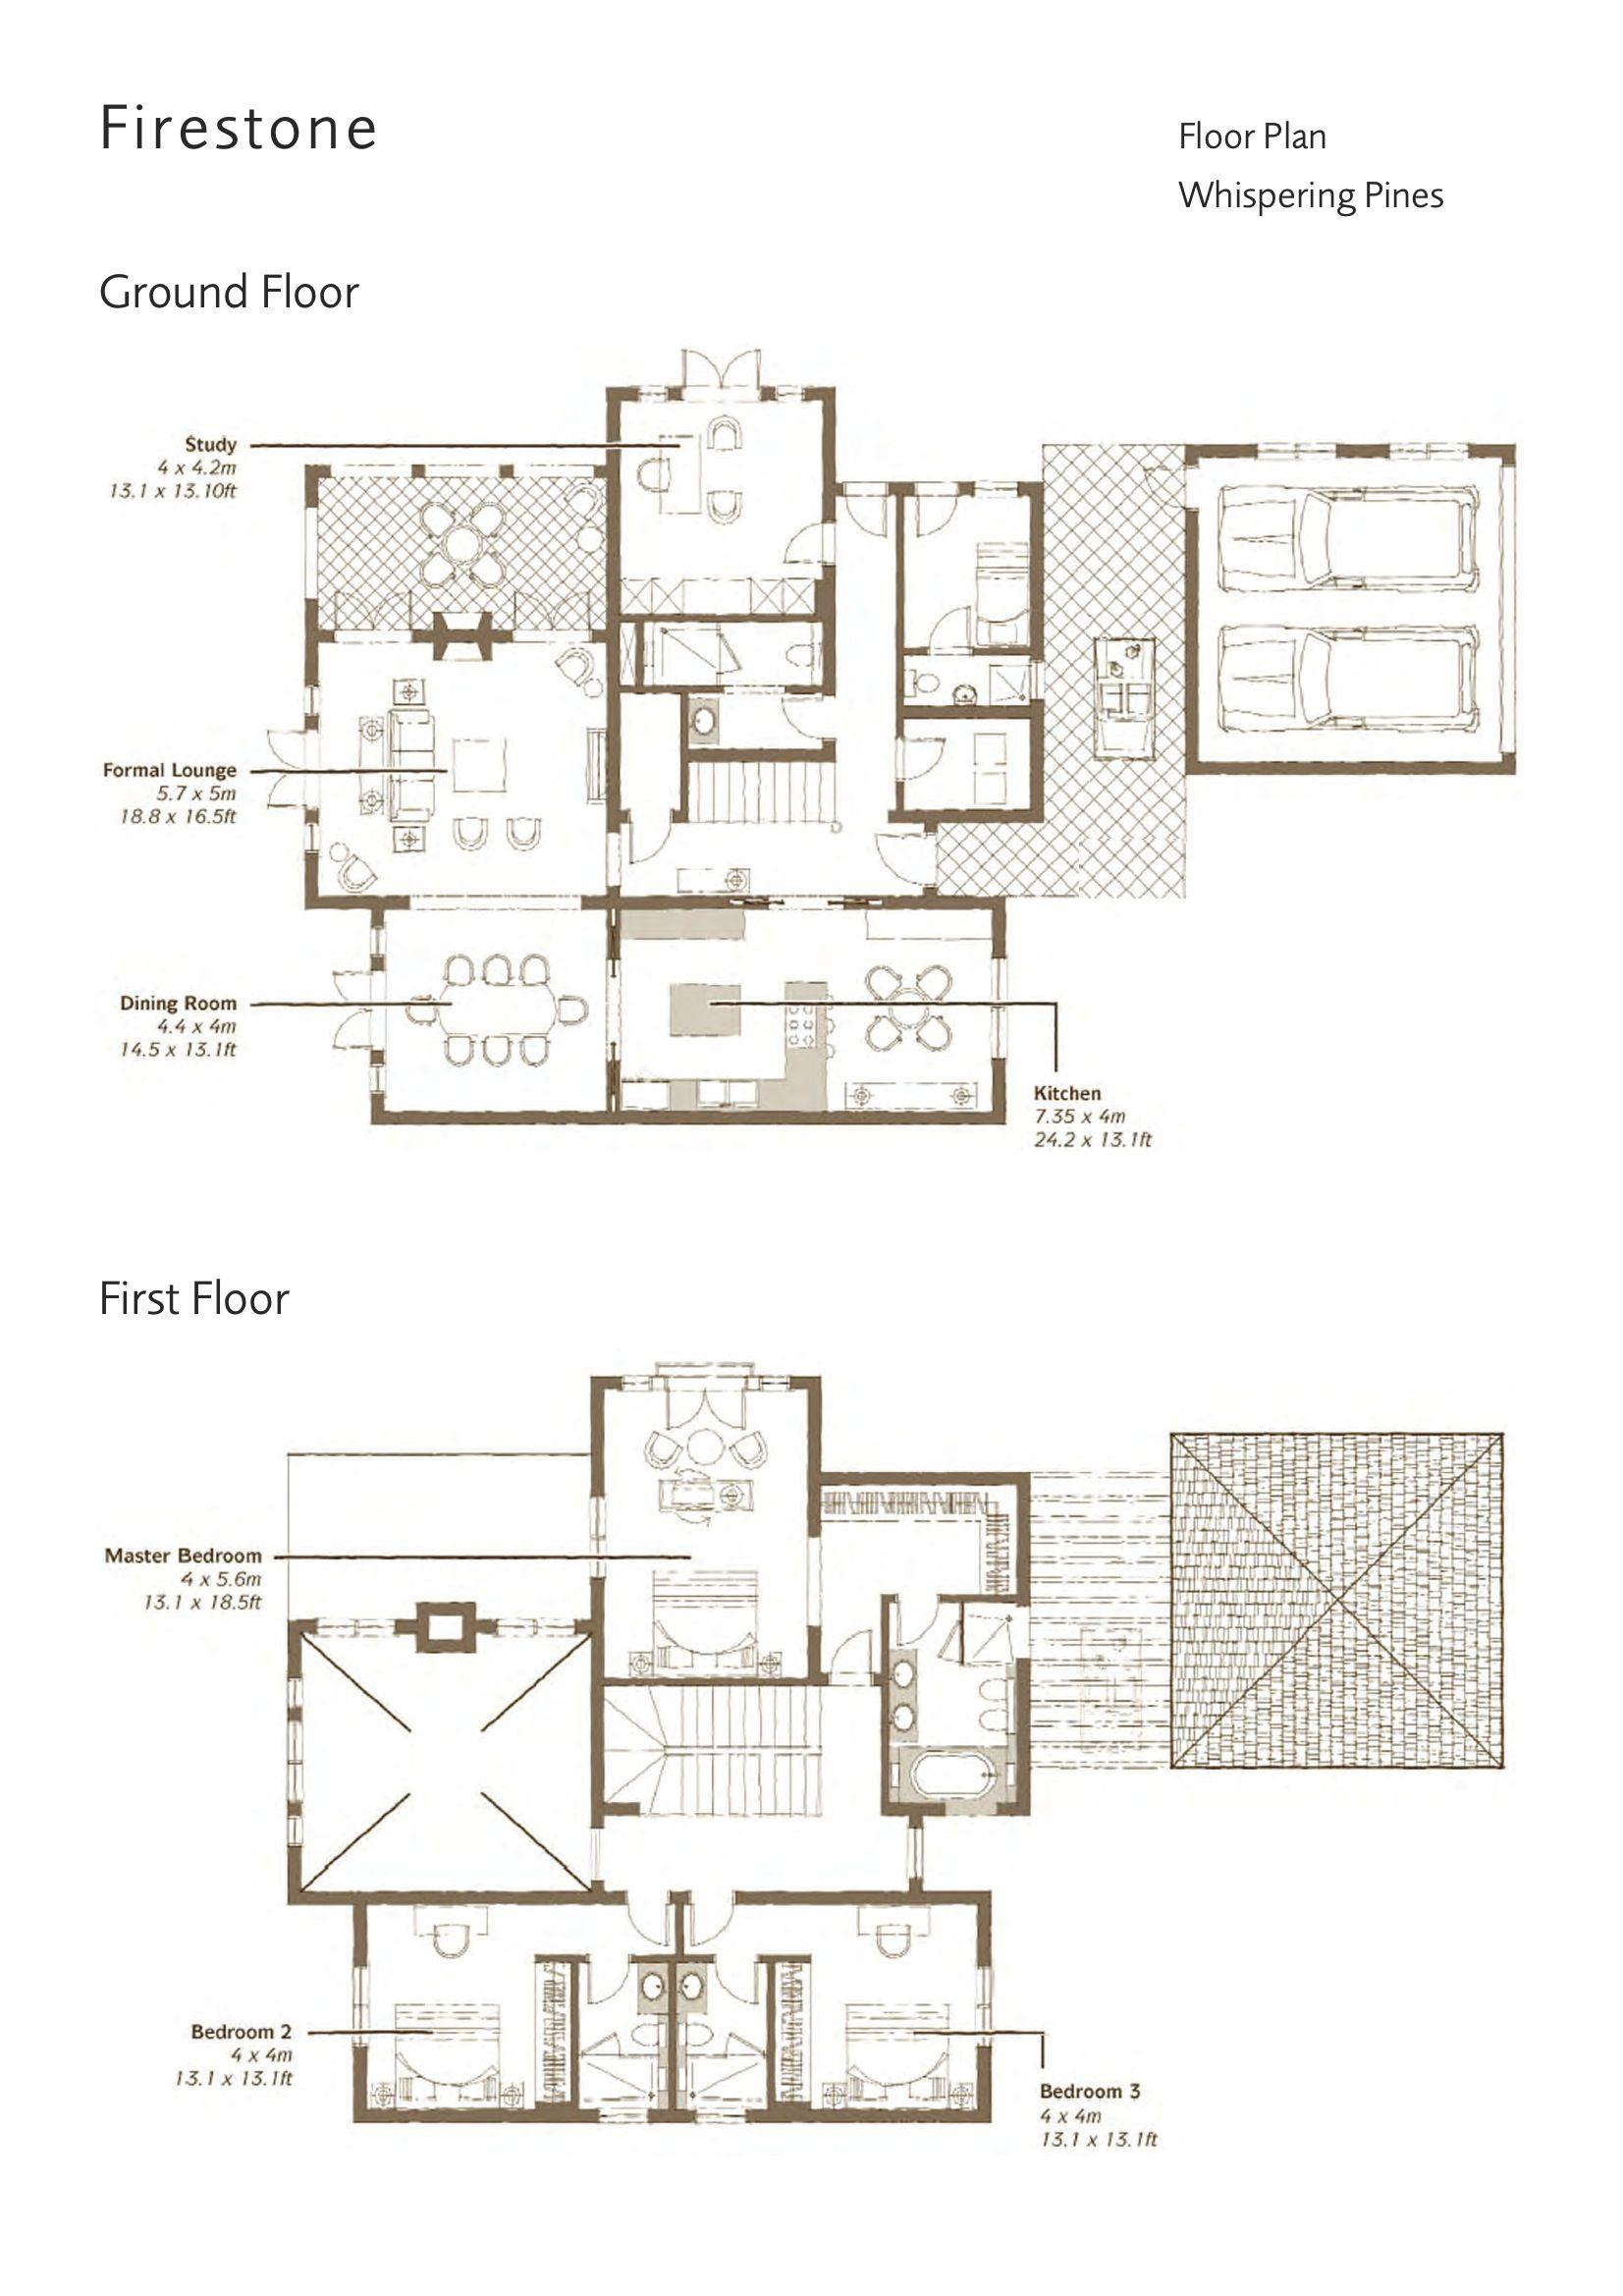 Whispering Pines Villas Floor Plans Jumeirah Golf Estates Dubai Uae Floor Plans How To Plan Villa Plan